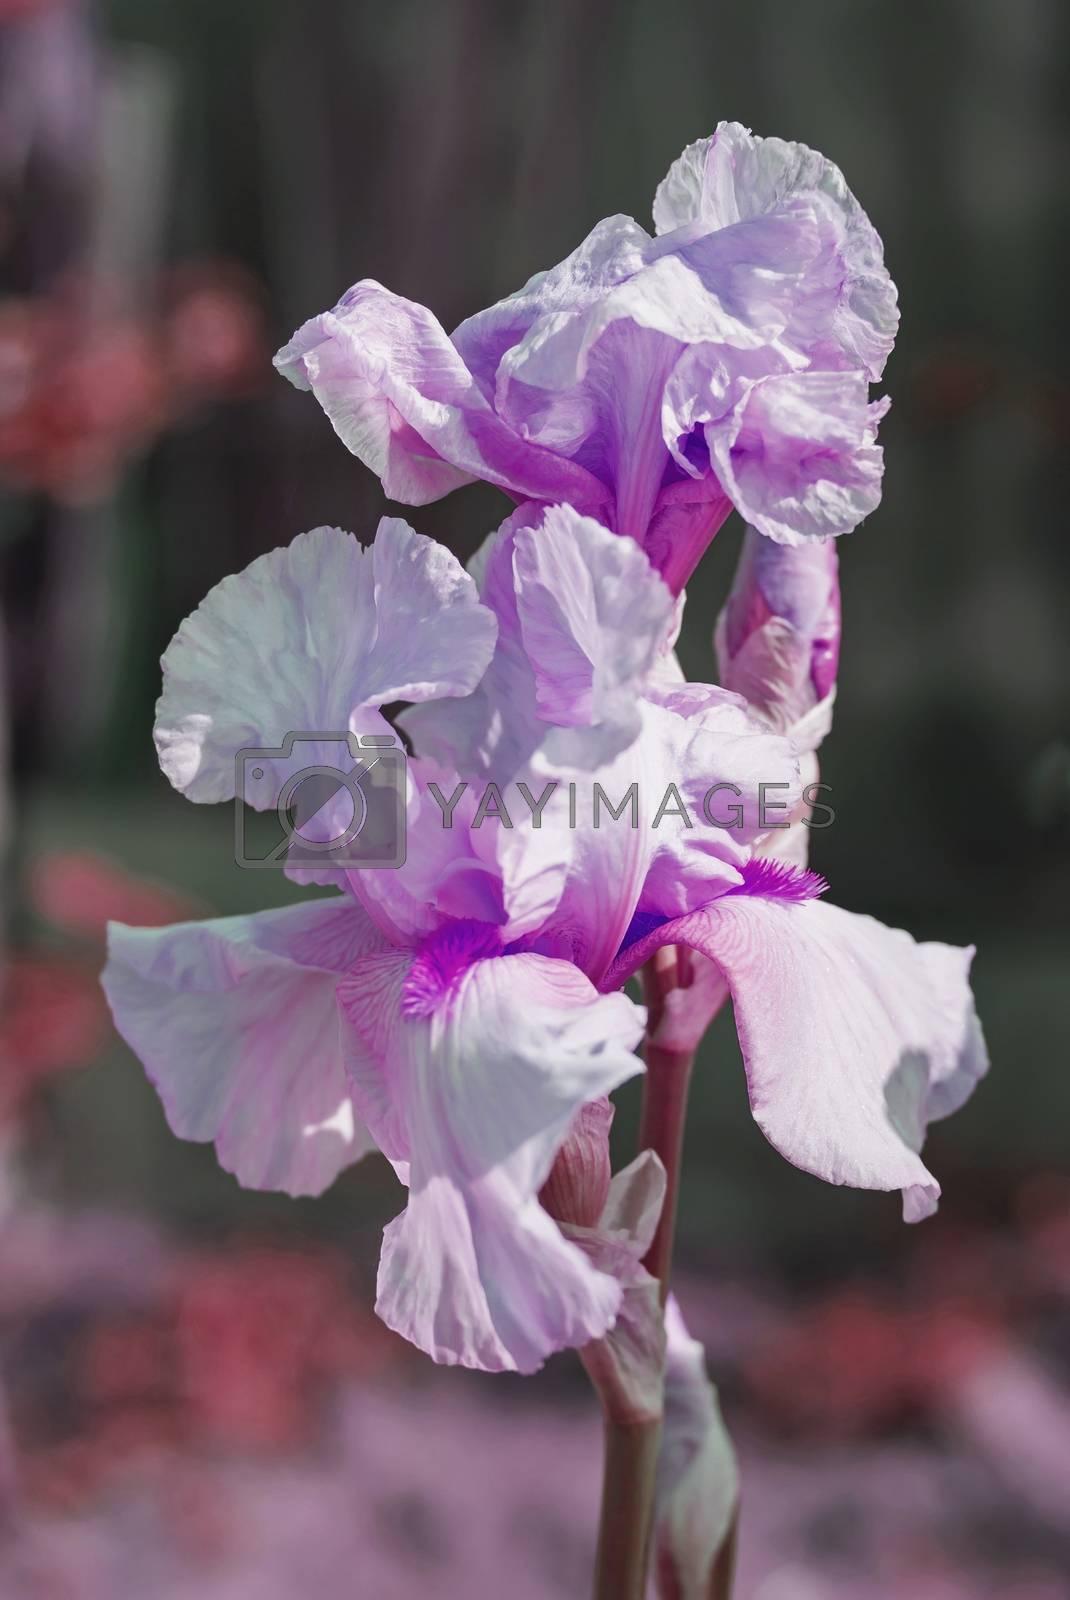 Pink Iris (lat. Íris) flowerbed flowers, perennial, spring flower, soft focus